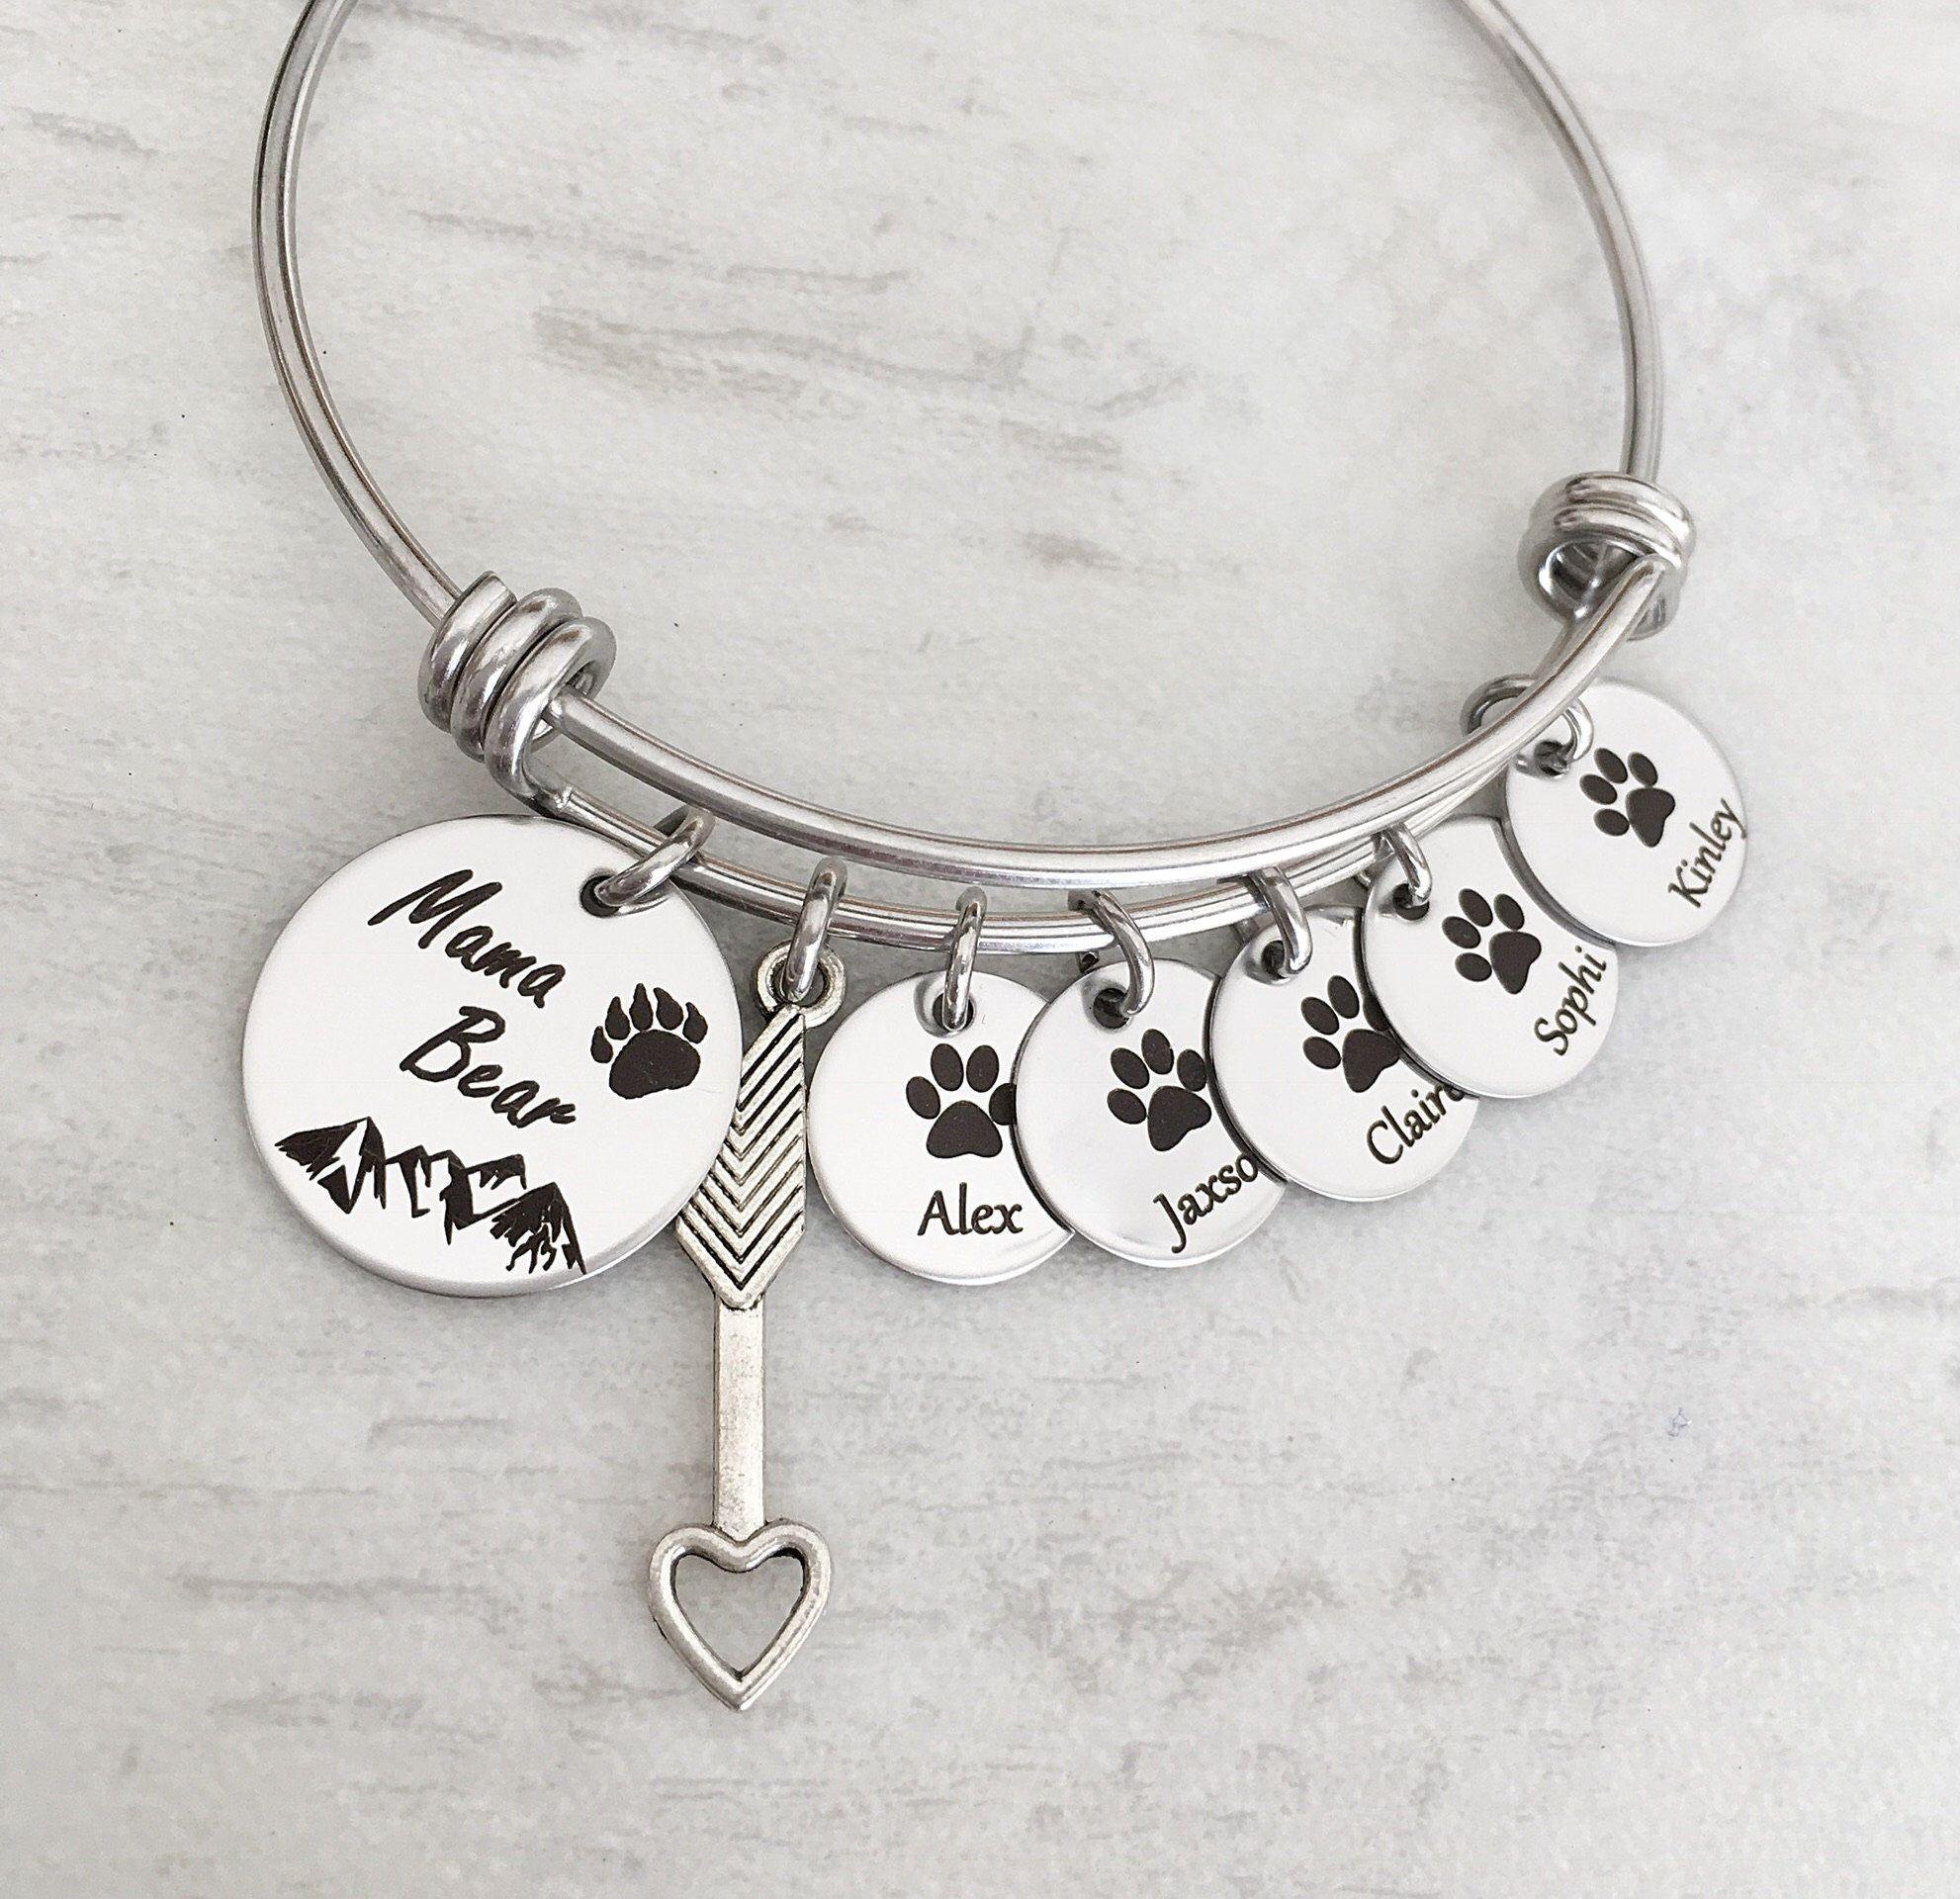 a94c8f582 Mama Bear personalized mothers bangle charm bracelet. Children's cub paw  charm. https:/